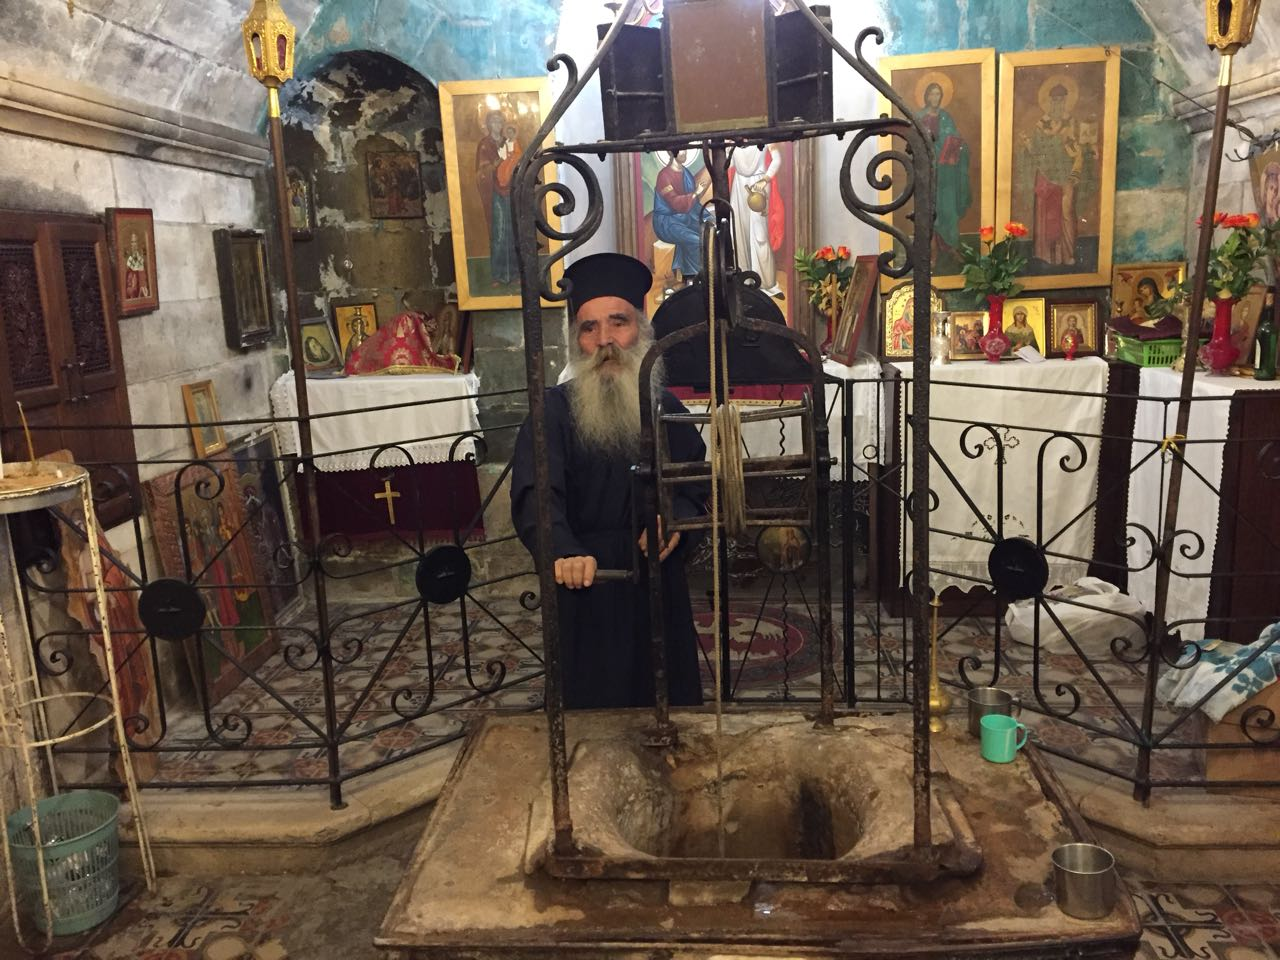 Arhimandrit-Iustin_Mamalla-nastoiatel-monastyria-u-kolodtca-Iakova